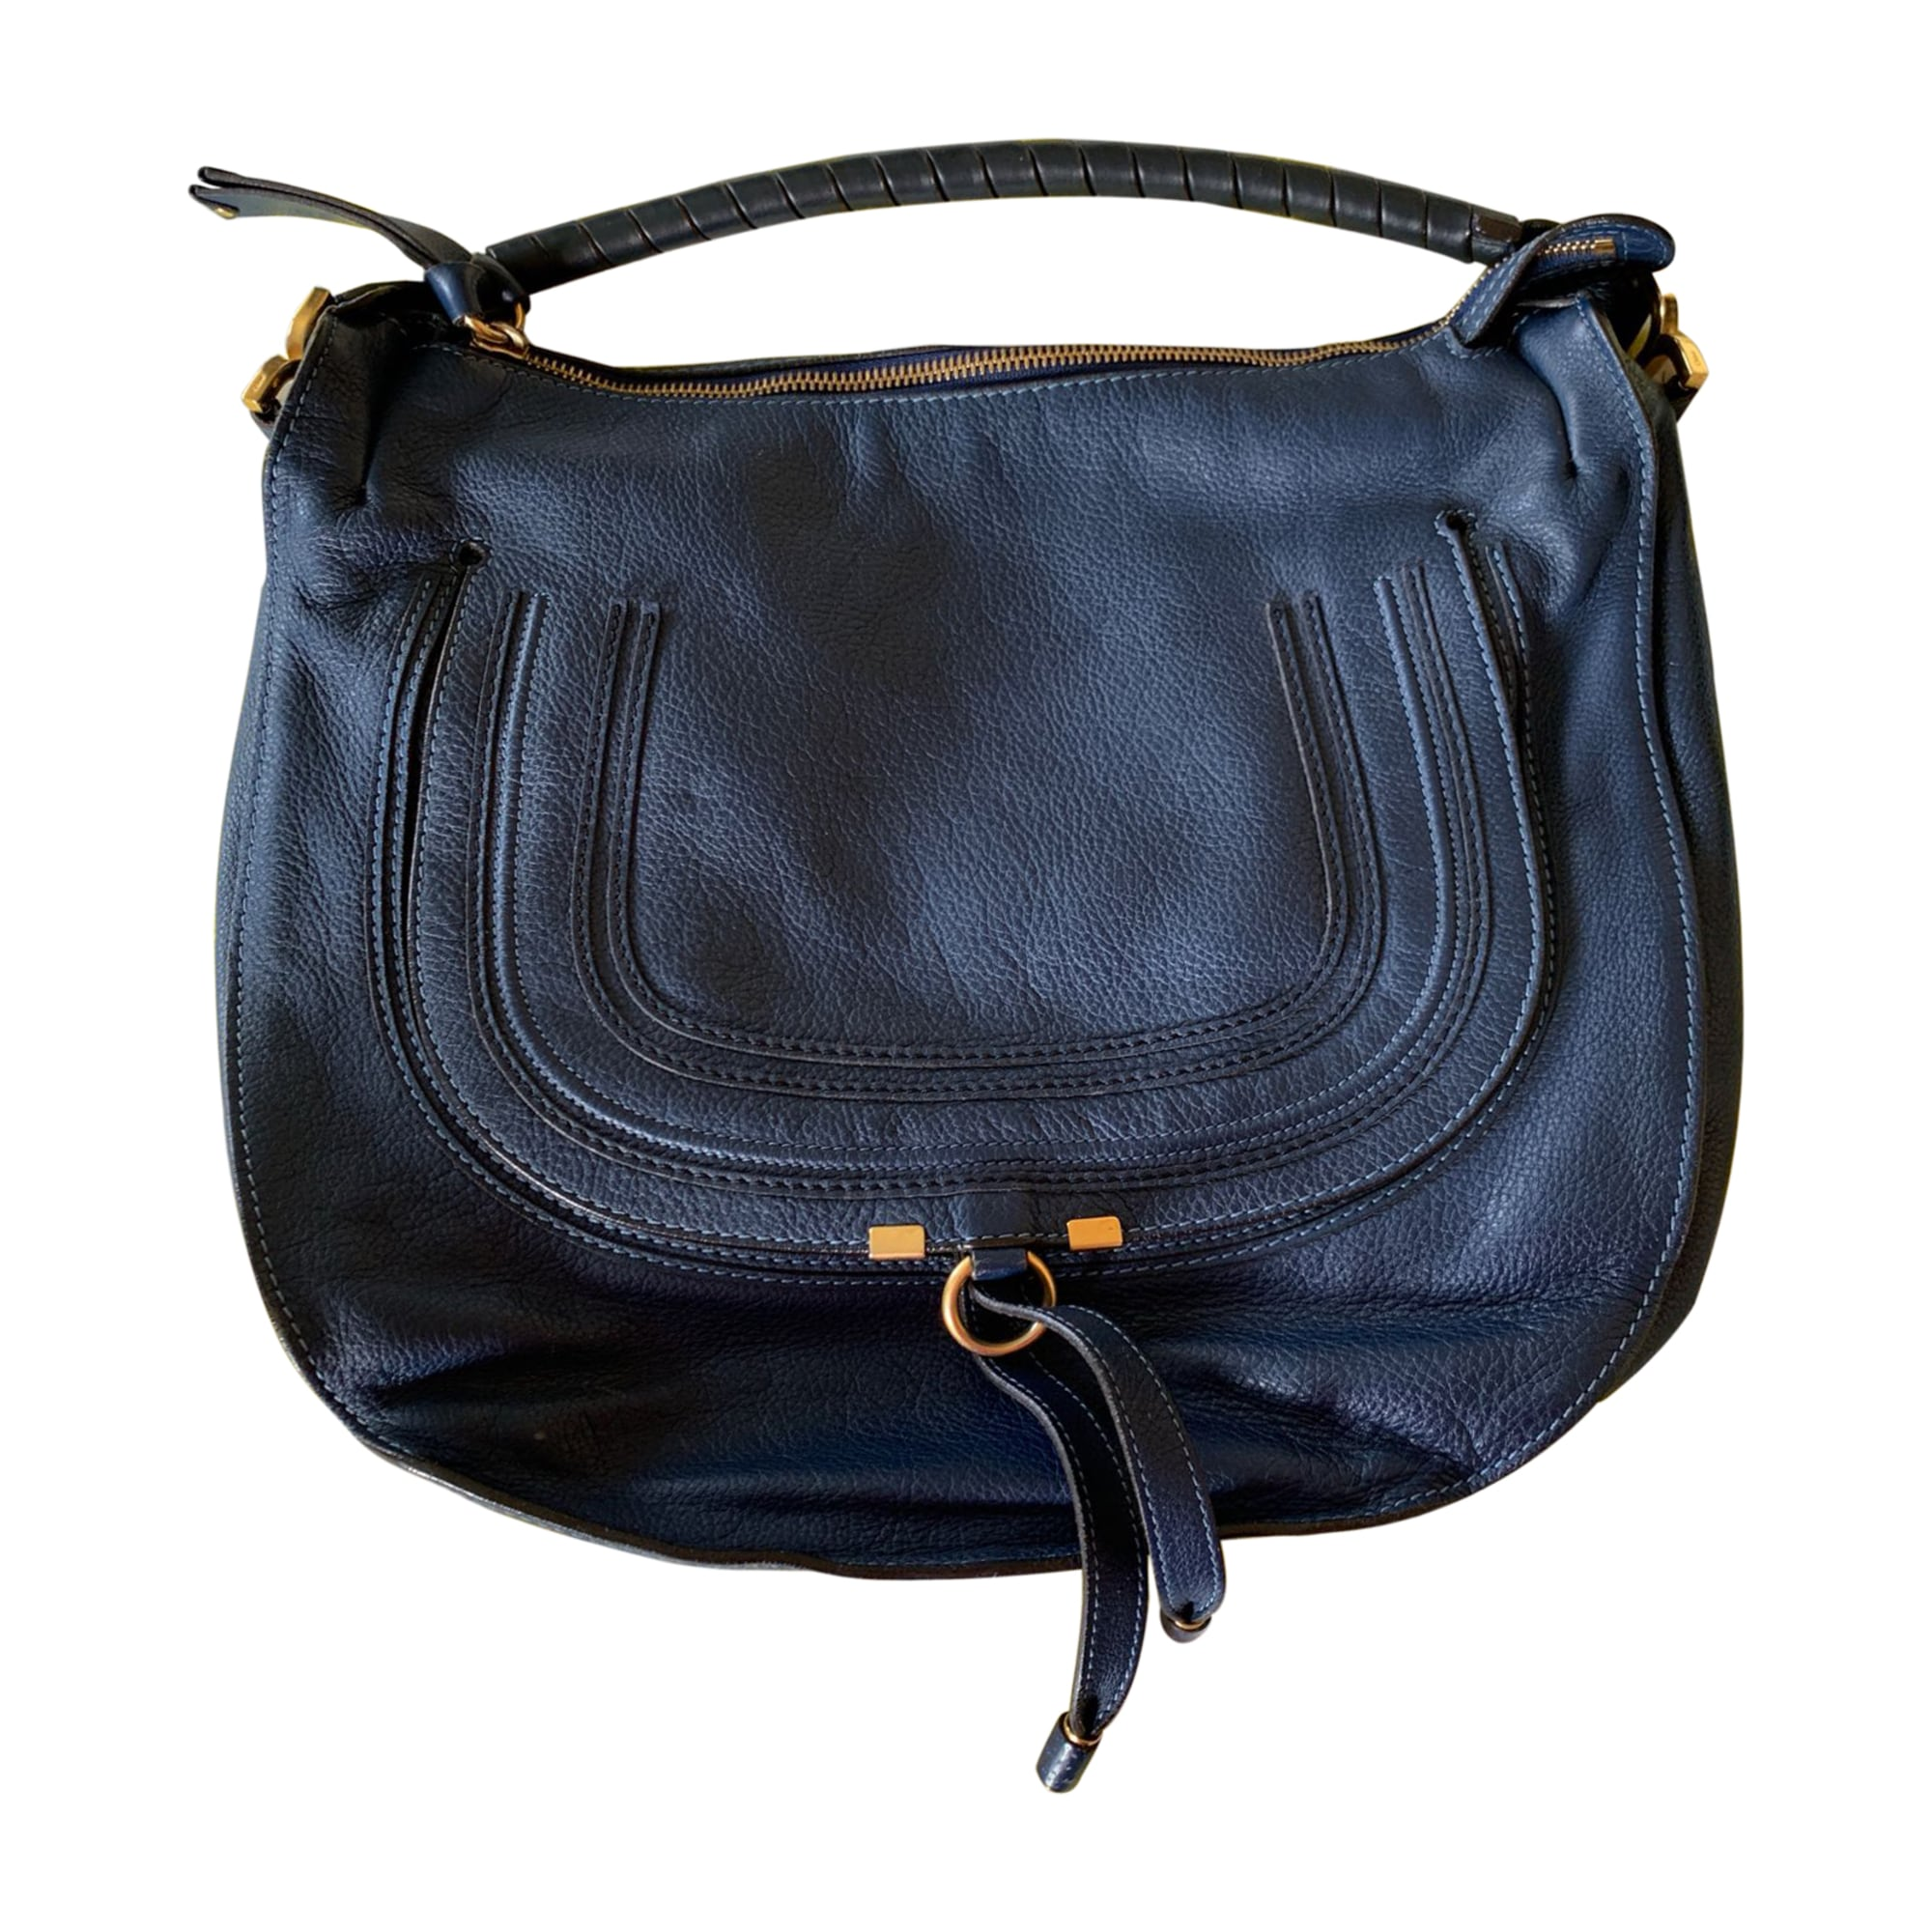 Leather Handbag CHLOÉ Blue, navy, turquoise